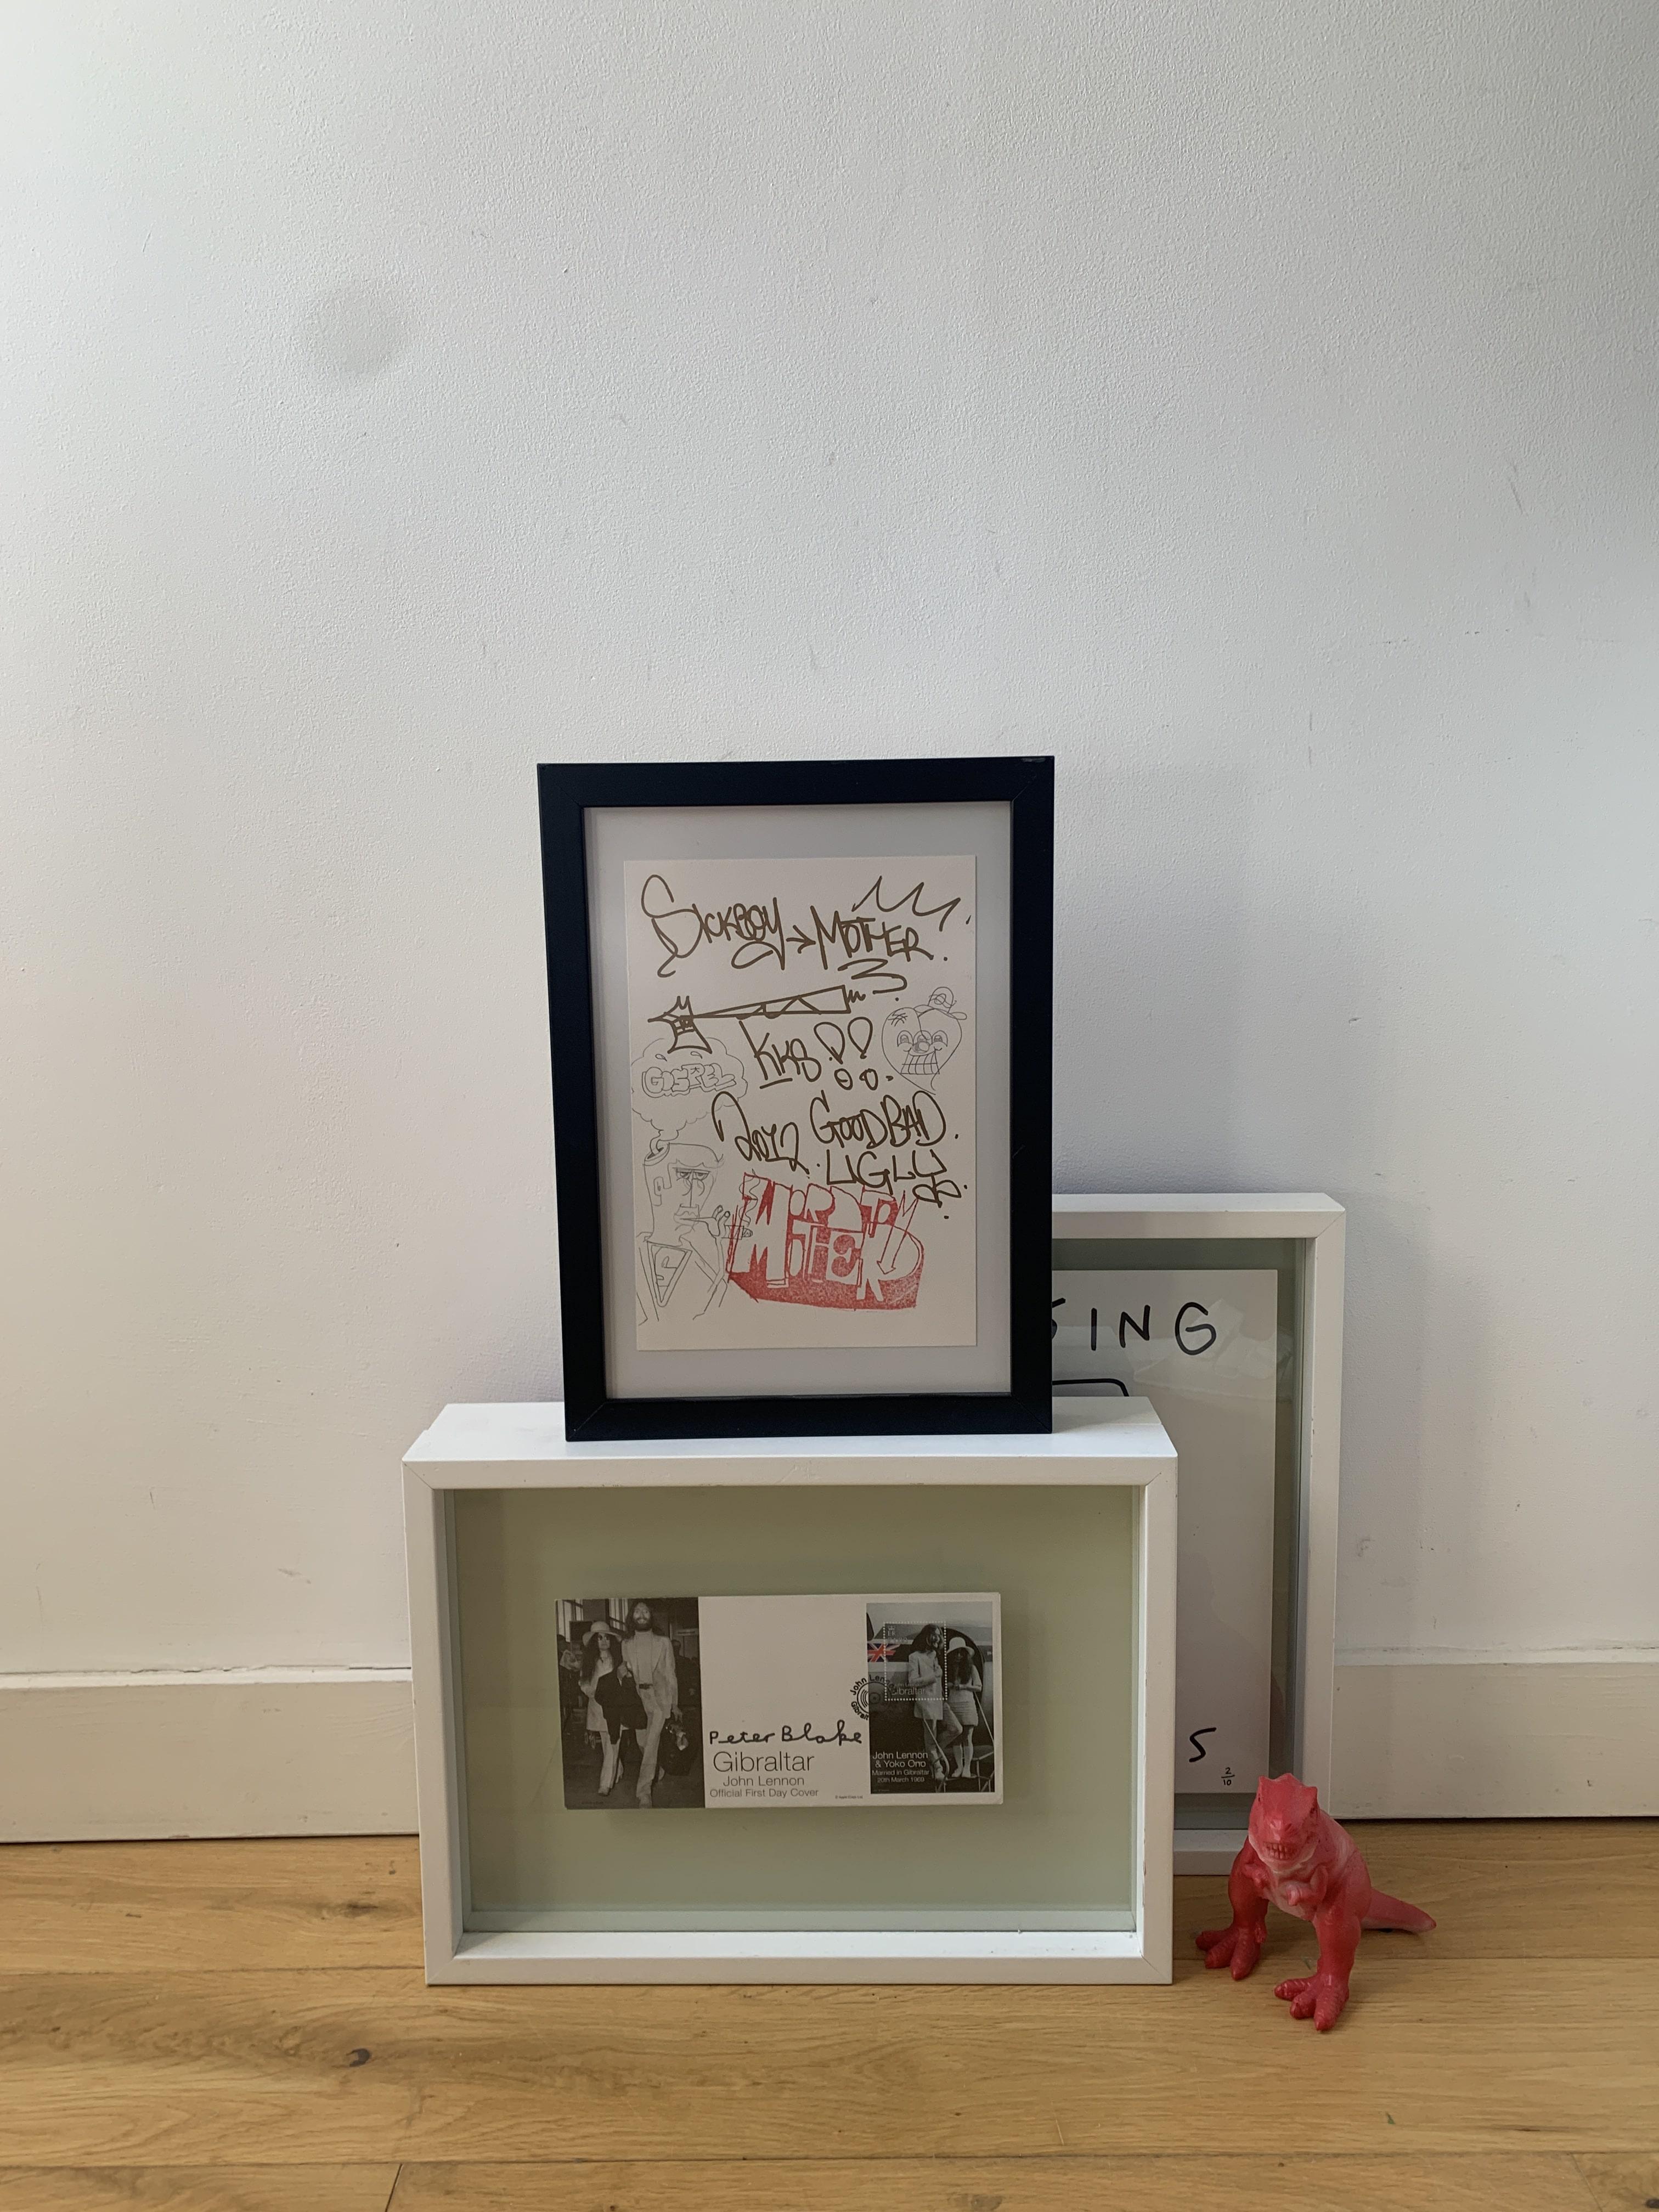 Mother x Sickboy hand-drawn collaboration